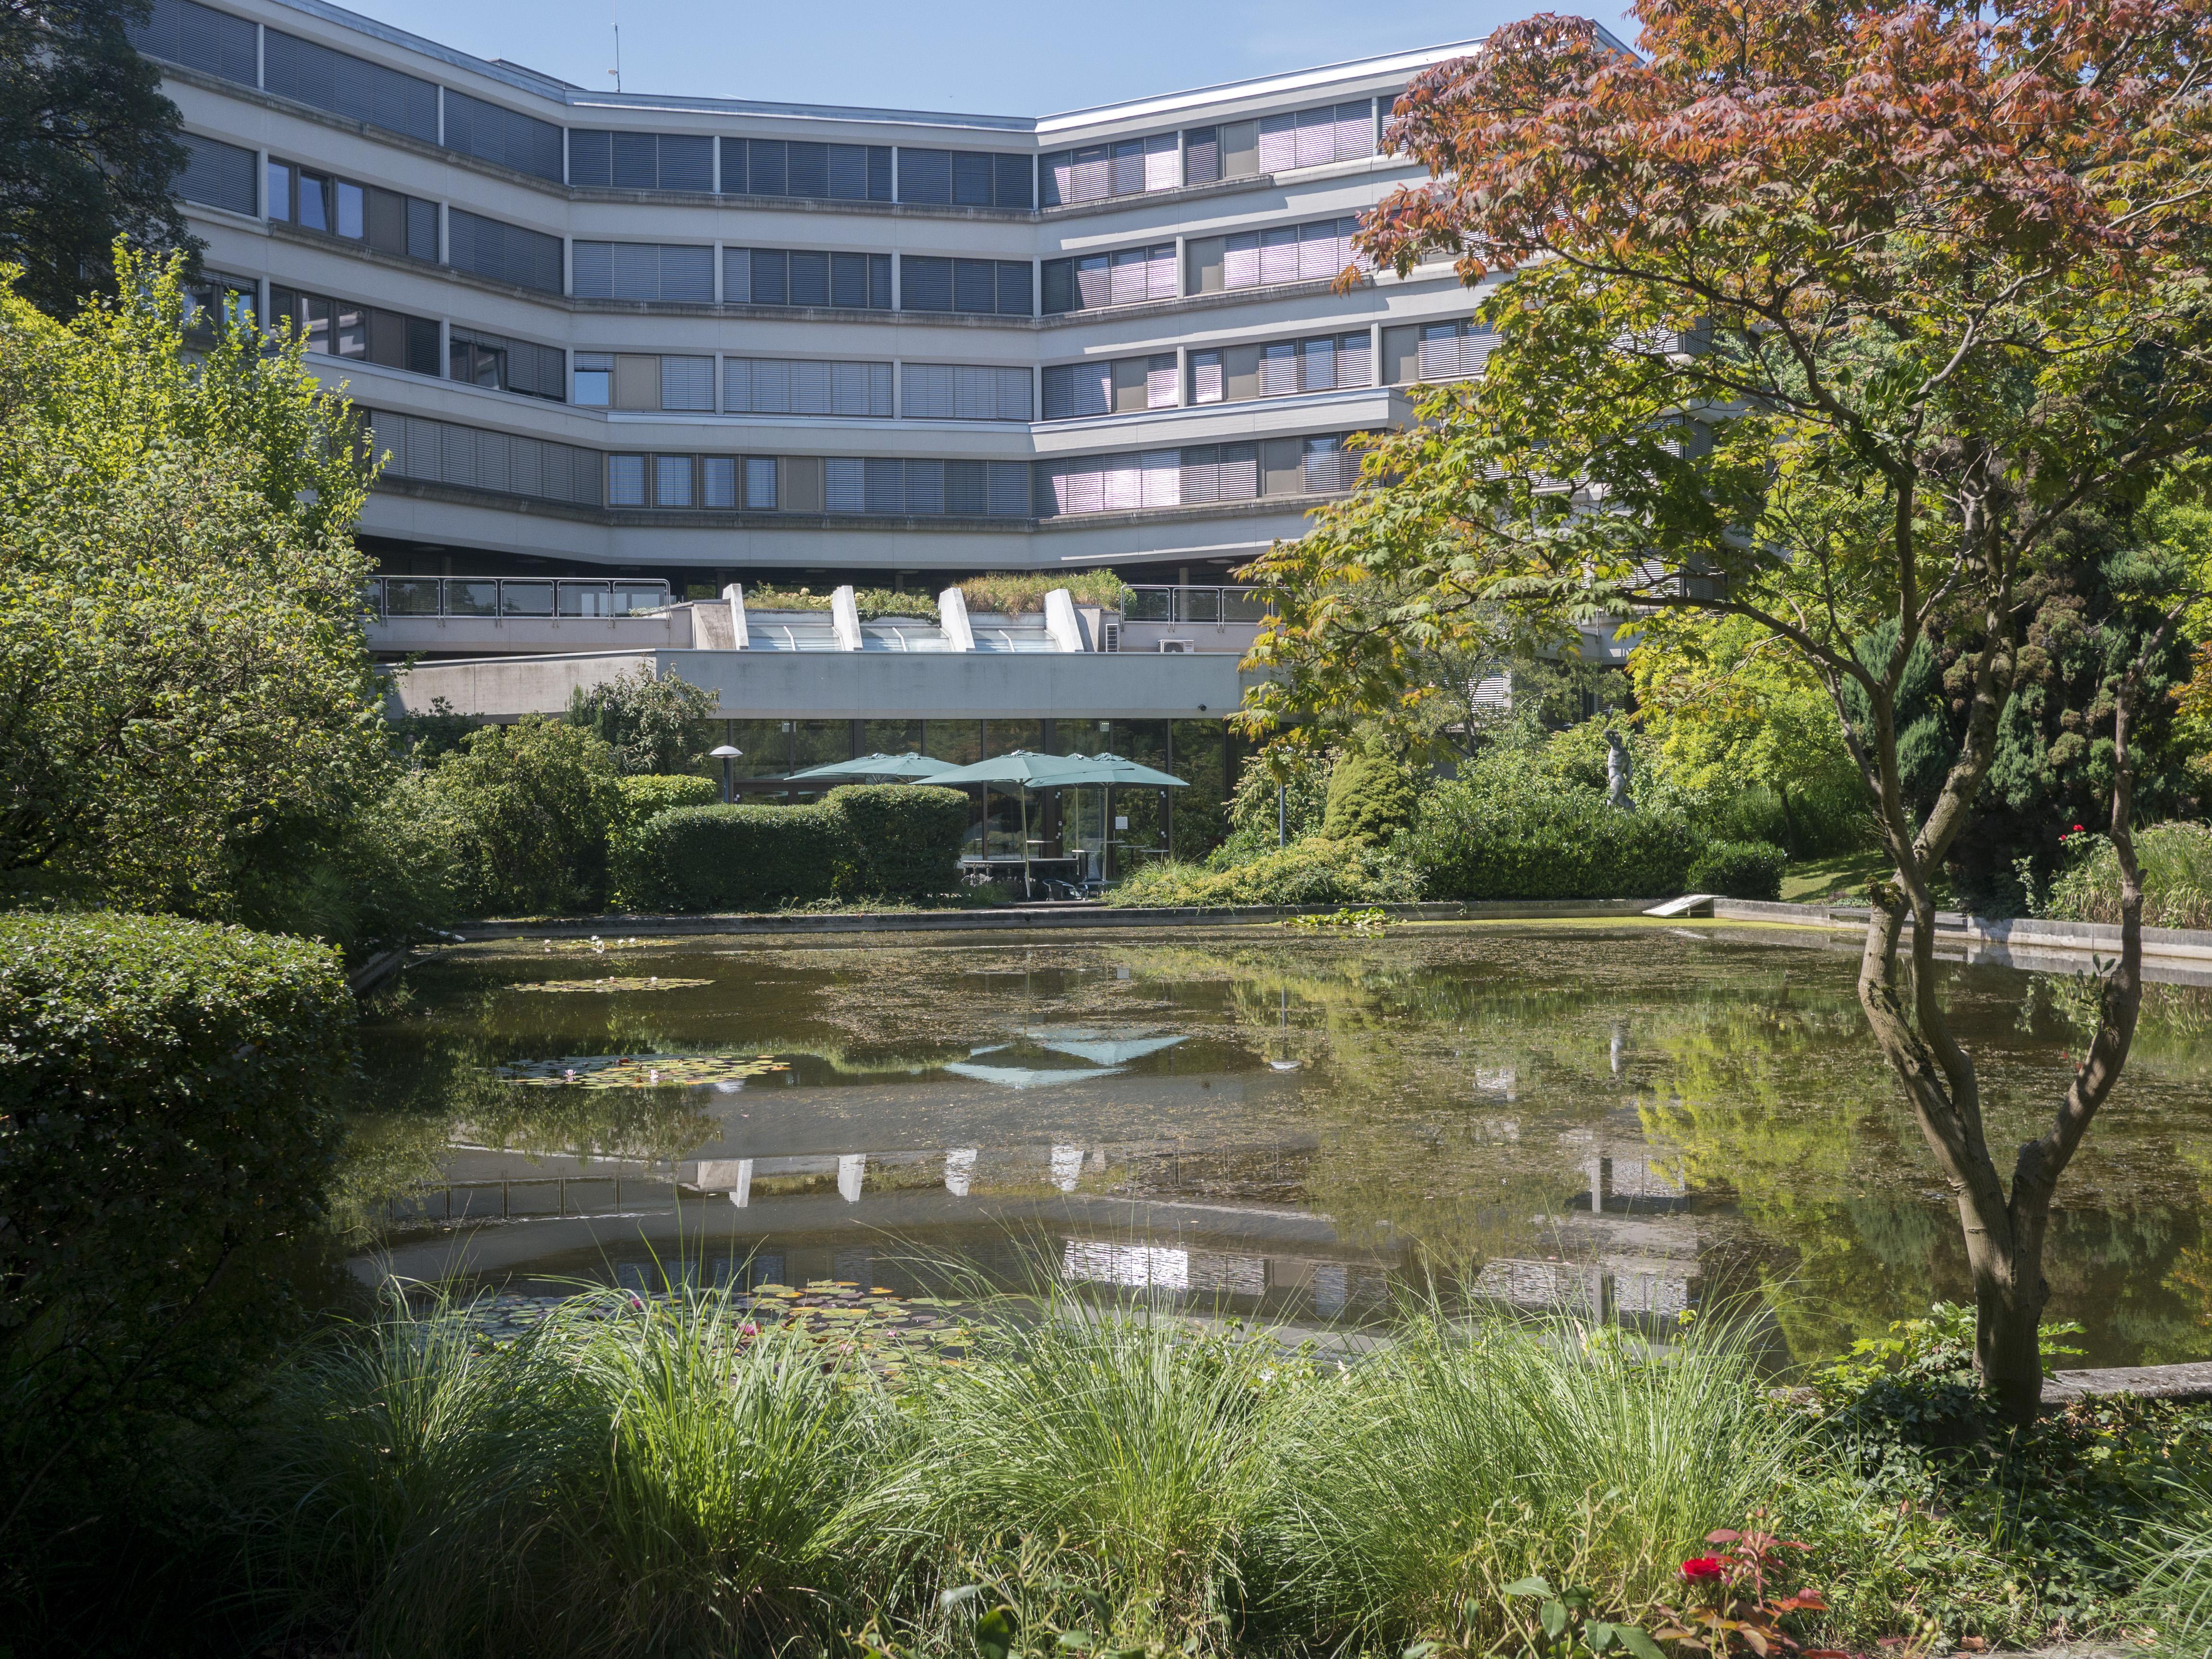 Gartenbau Linz file linz hatschekvilla gartenbaudenkmal 7 jpg wikimedia commons